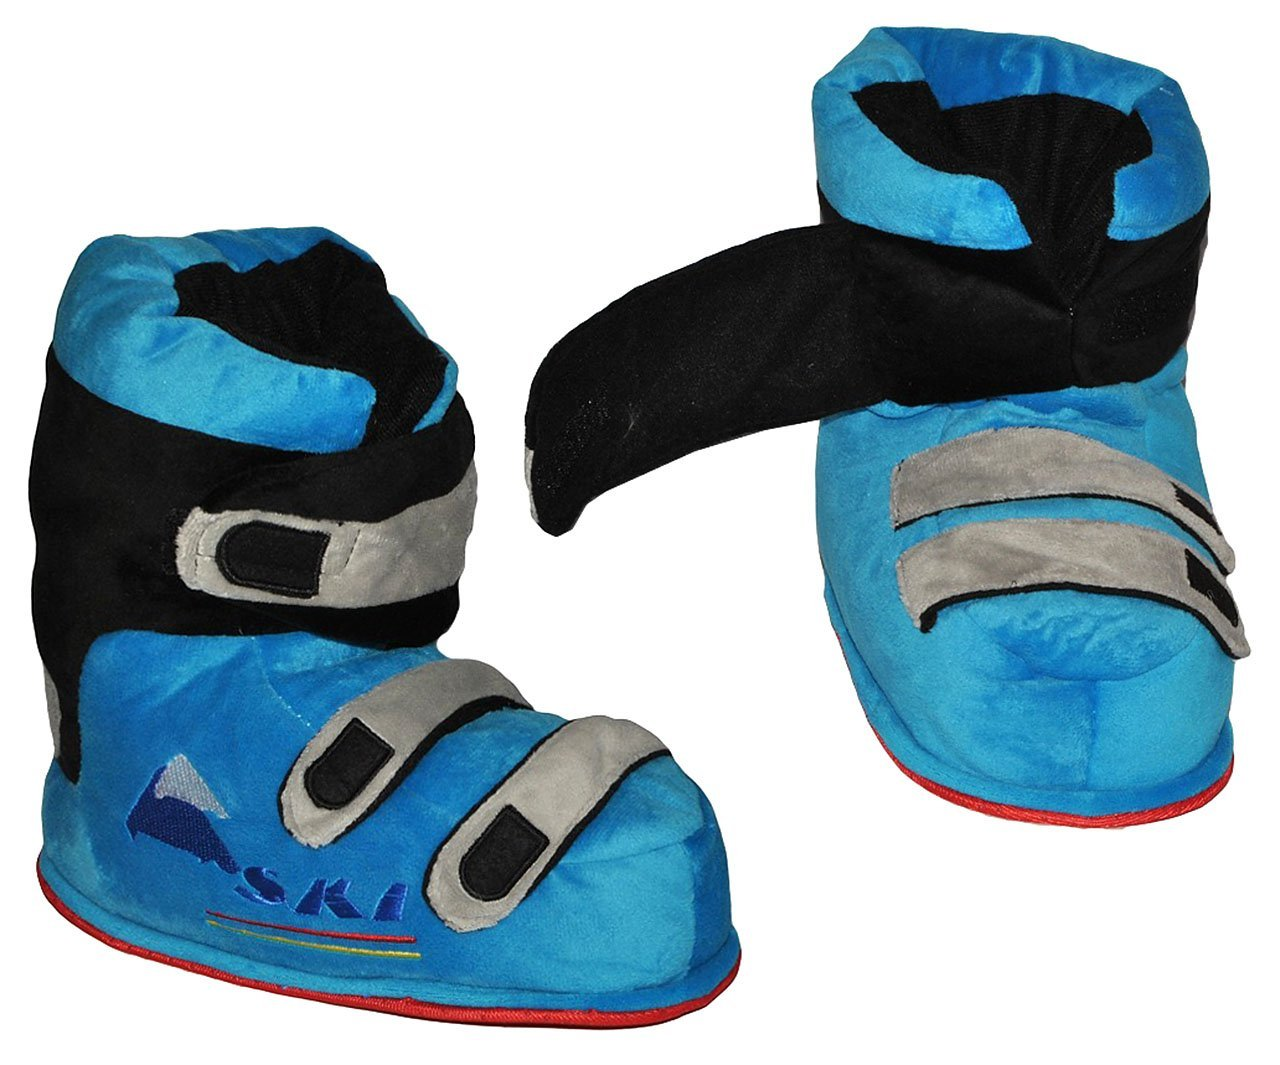 Unbekannt Hausschuhe - als blaue Skischuhe - SUPERWARM - Gr. 23 - 24 - gefütterte Plüschhausschuhe / Boots / Hausstiefel / Hausschuh Stiefel warm Skischuh / für Kinder .. Kinder-land